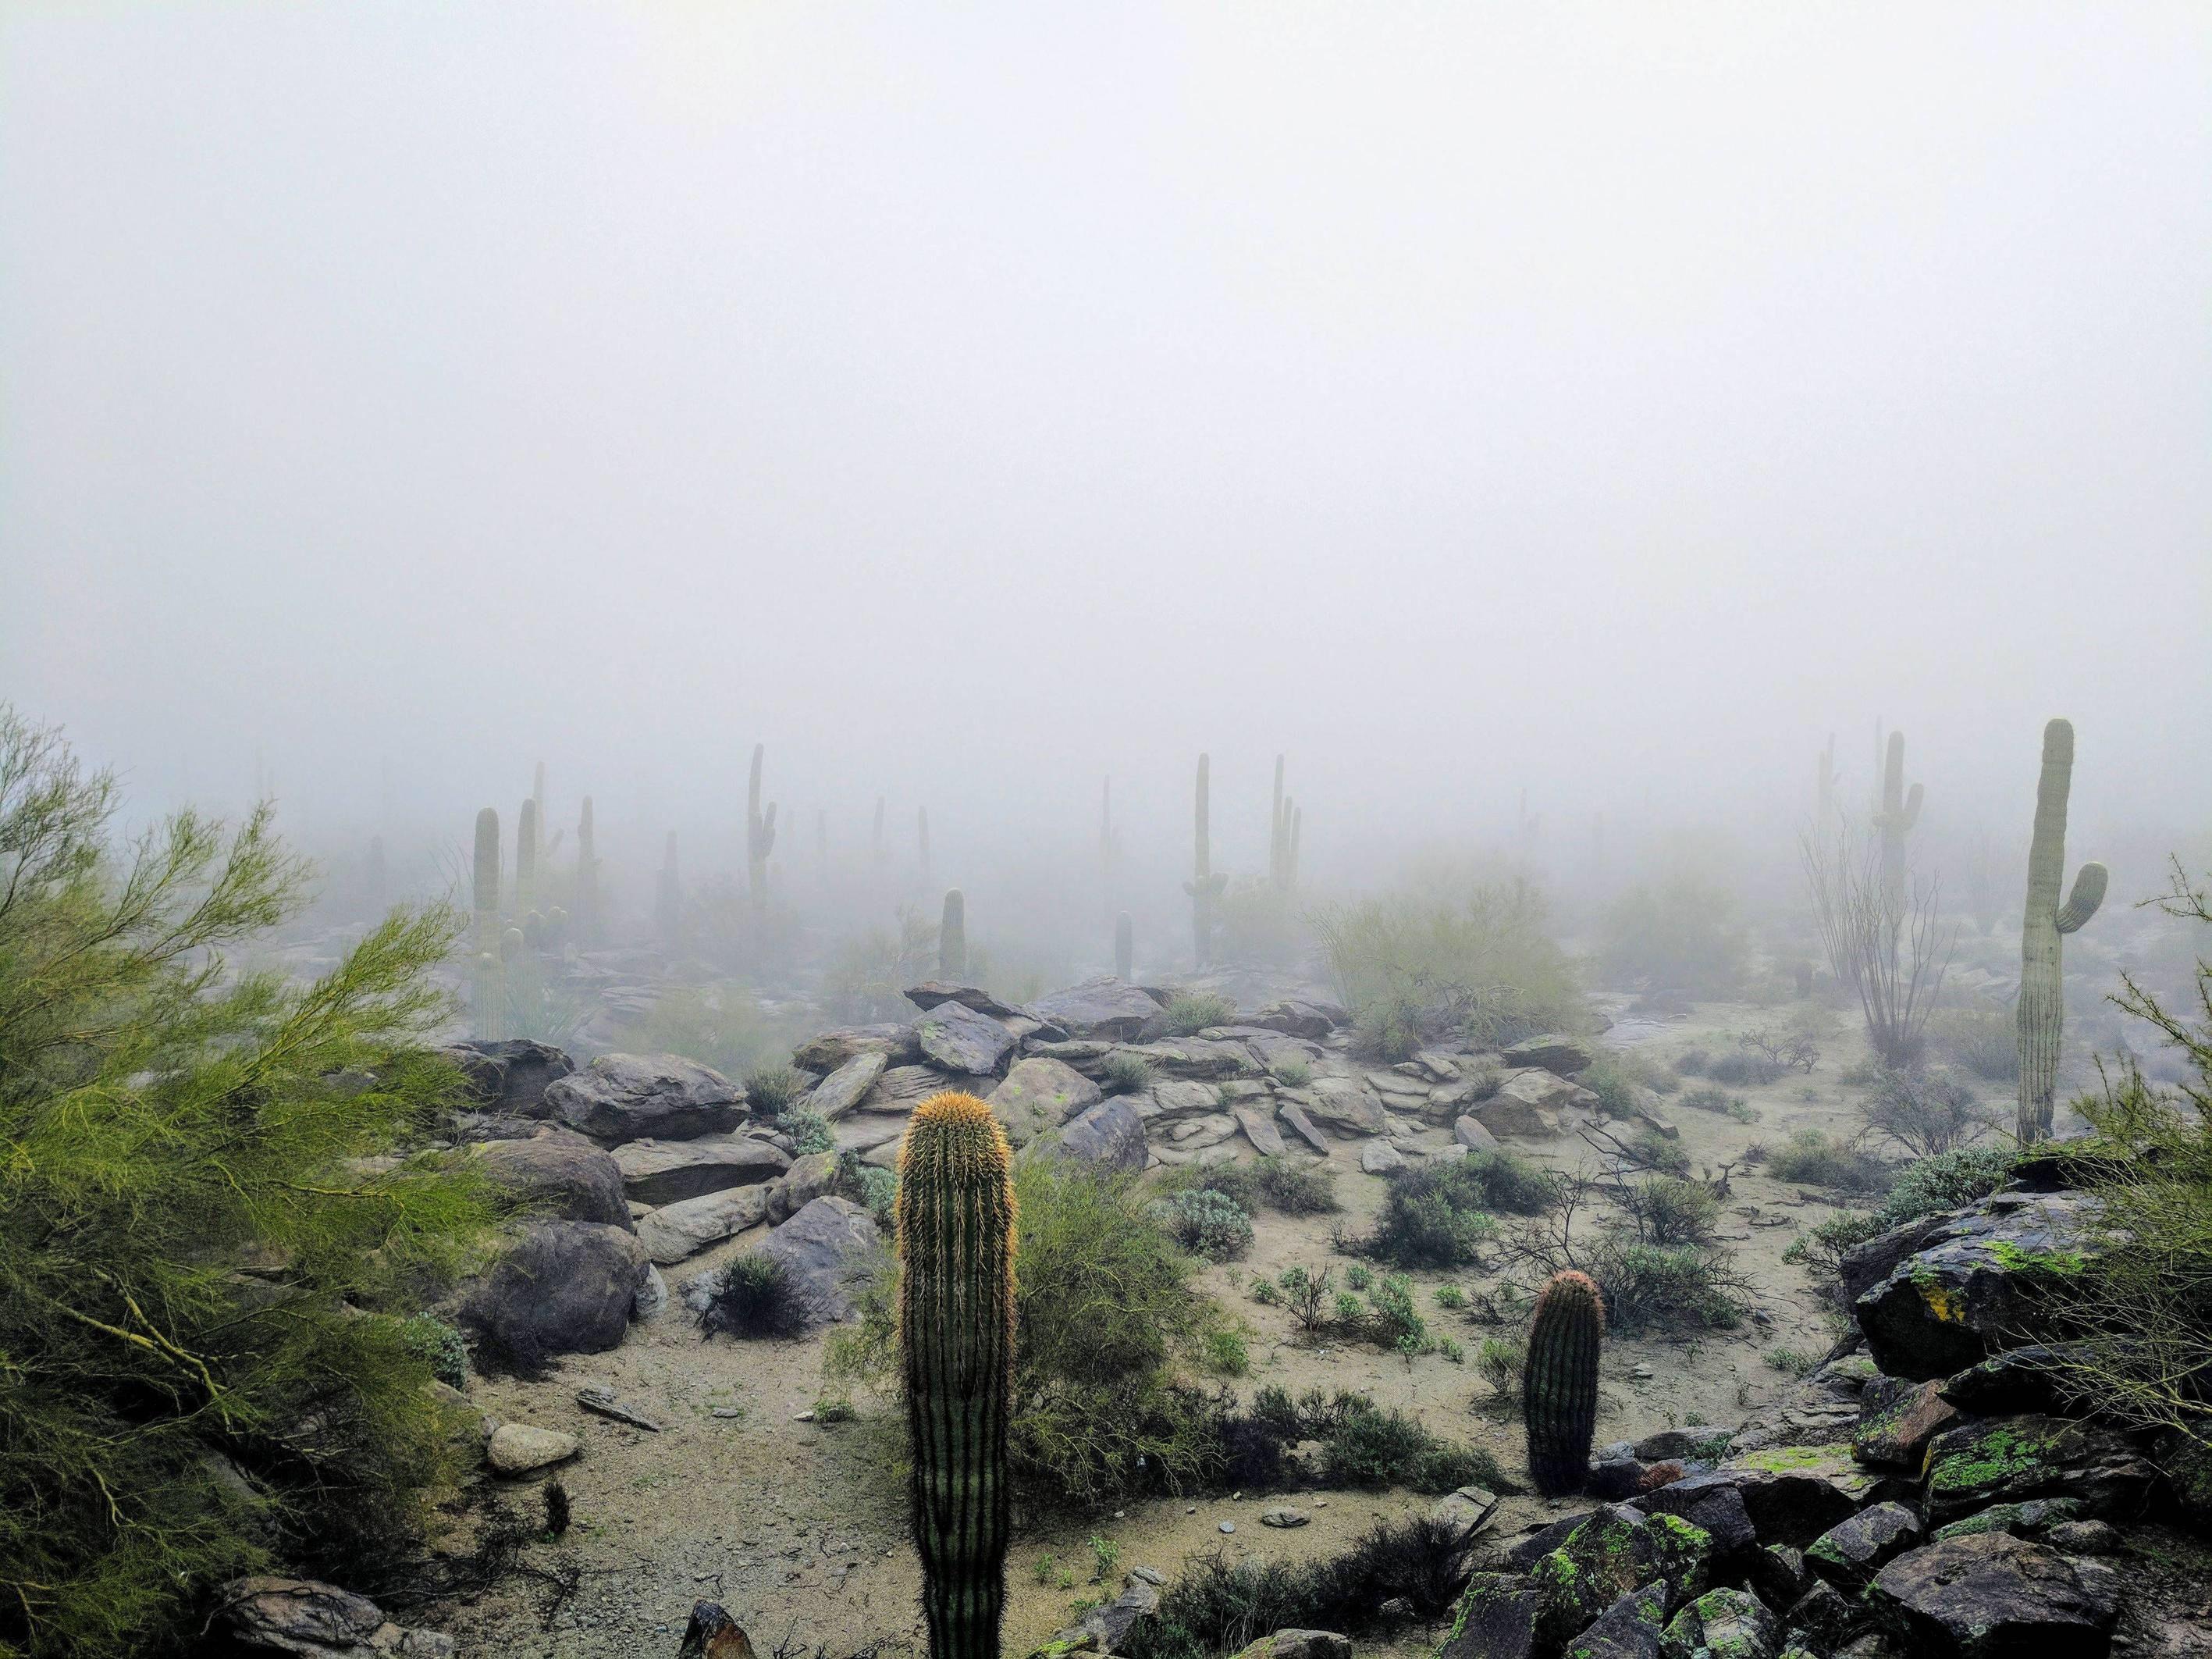 Cloud covered saguaro forest in Phoenix [4048x3036][OC]